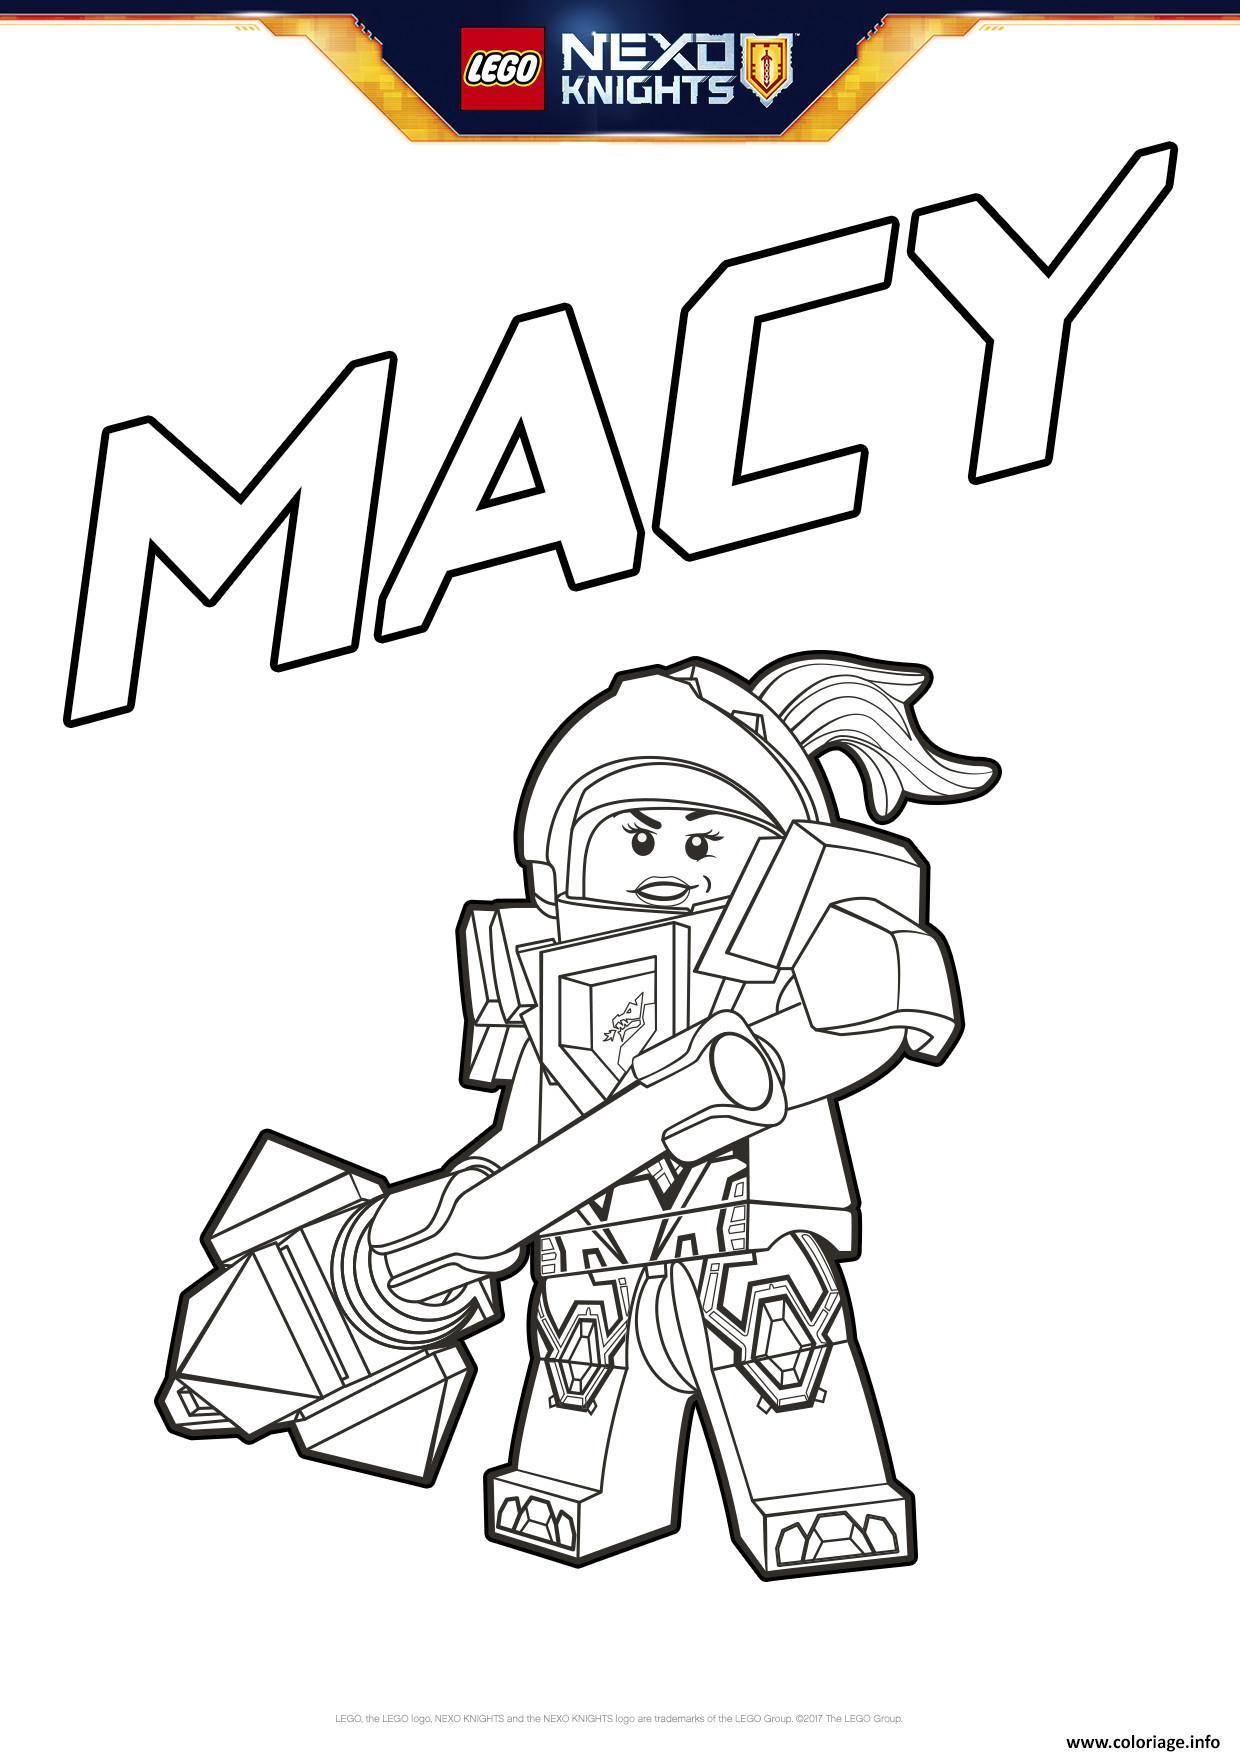 Coloriage Lego Nexo Knights Macy Dessin